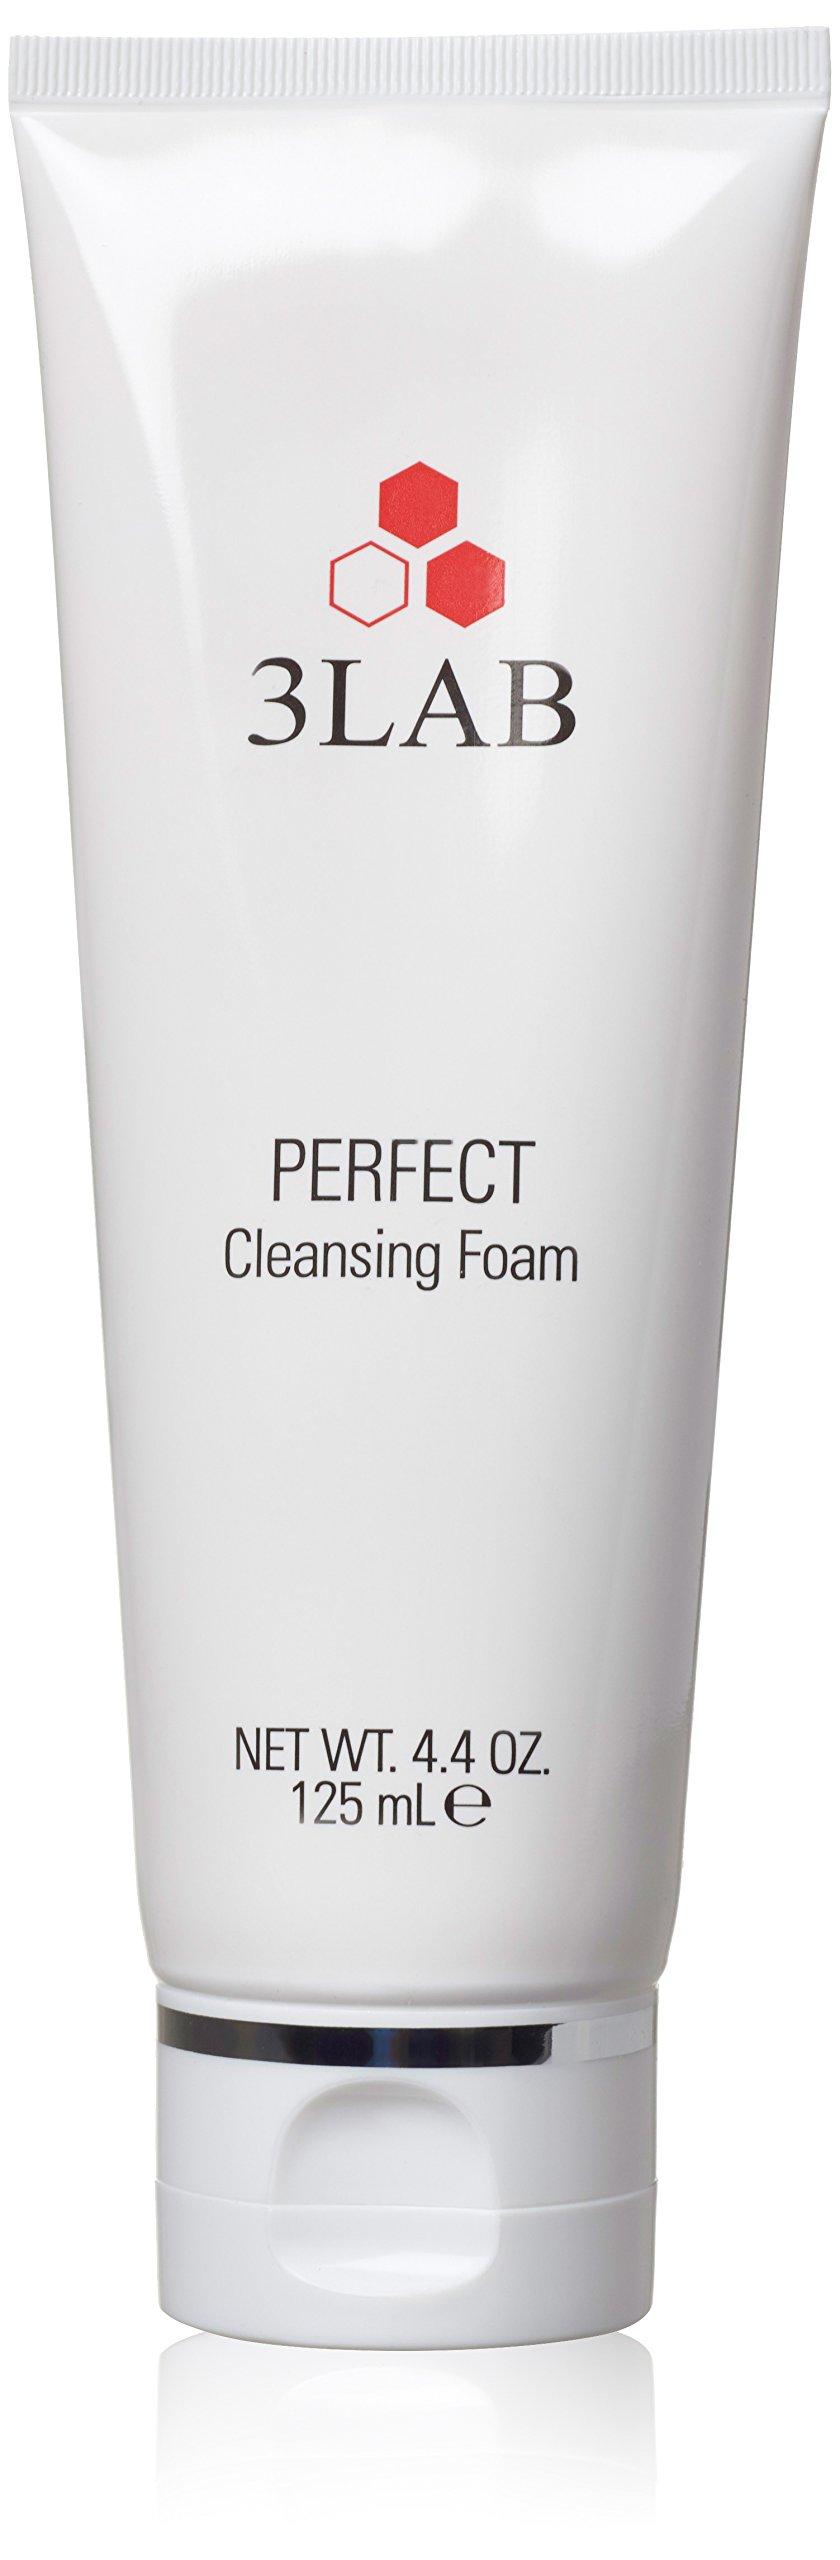 3LAB Perfect Cleansing Foam, 4.4 oz